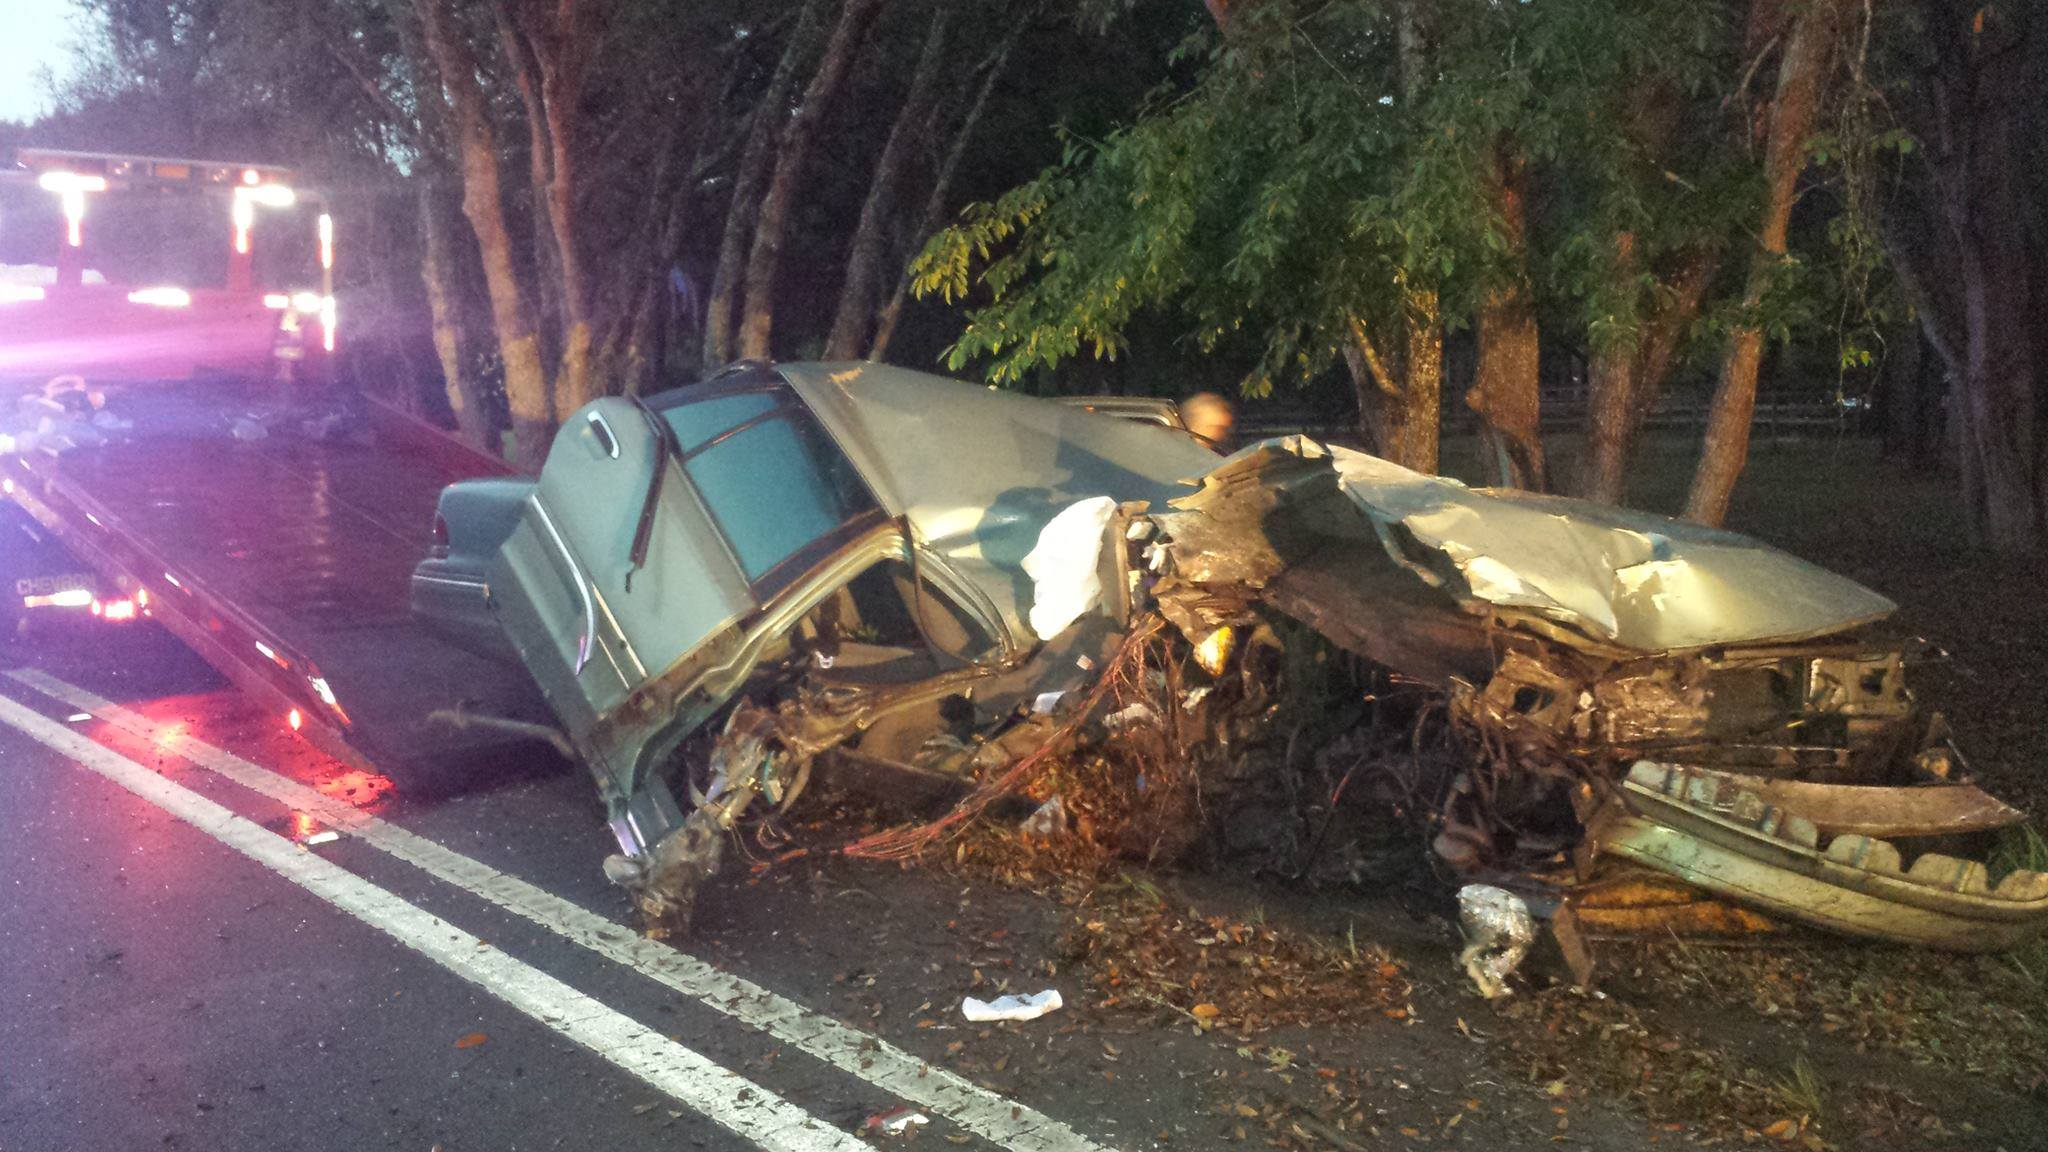 314a crash, marion county, car accident, ocala news,